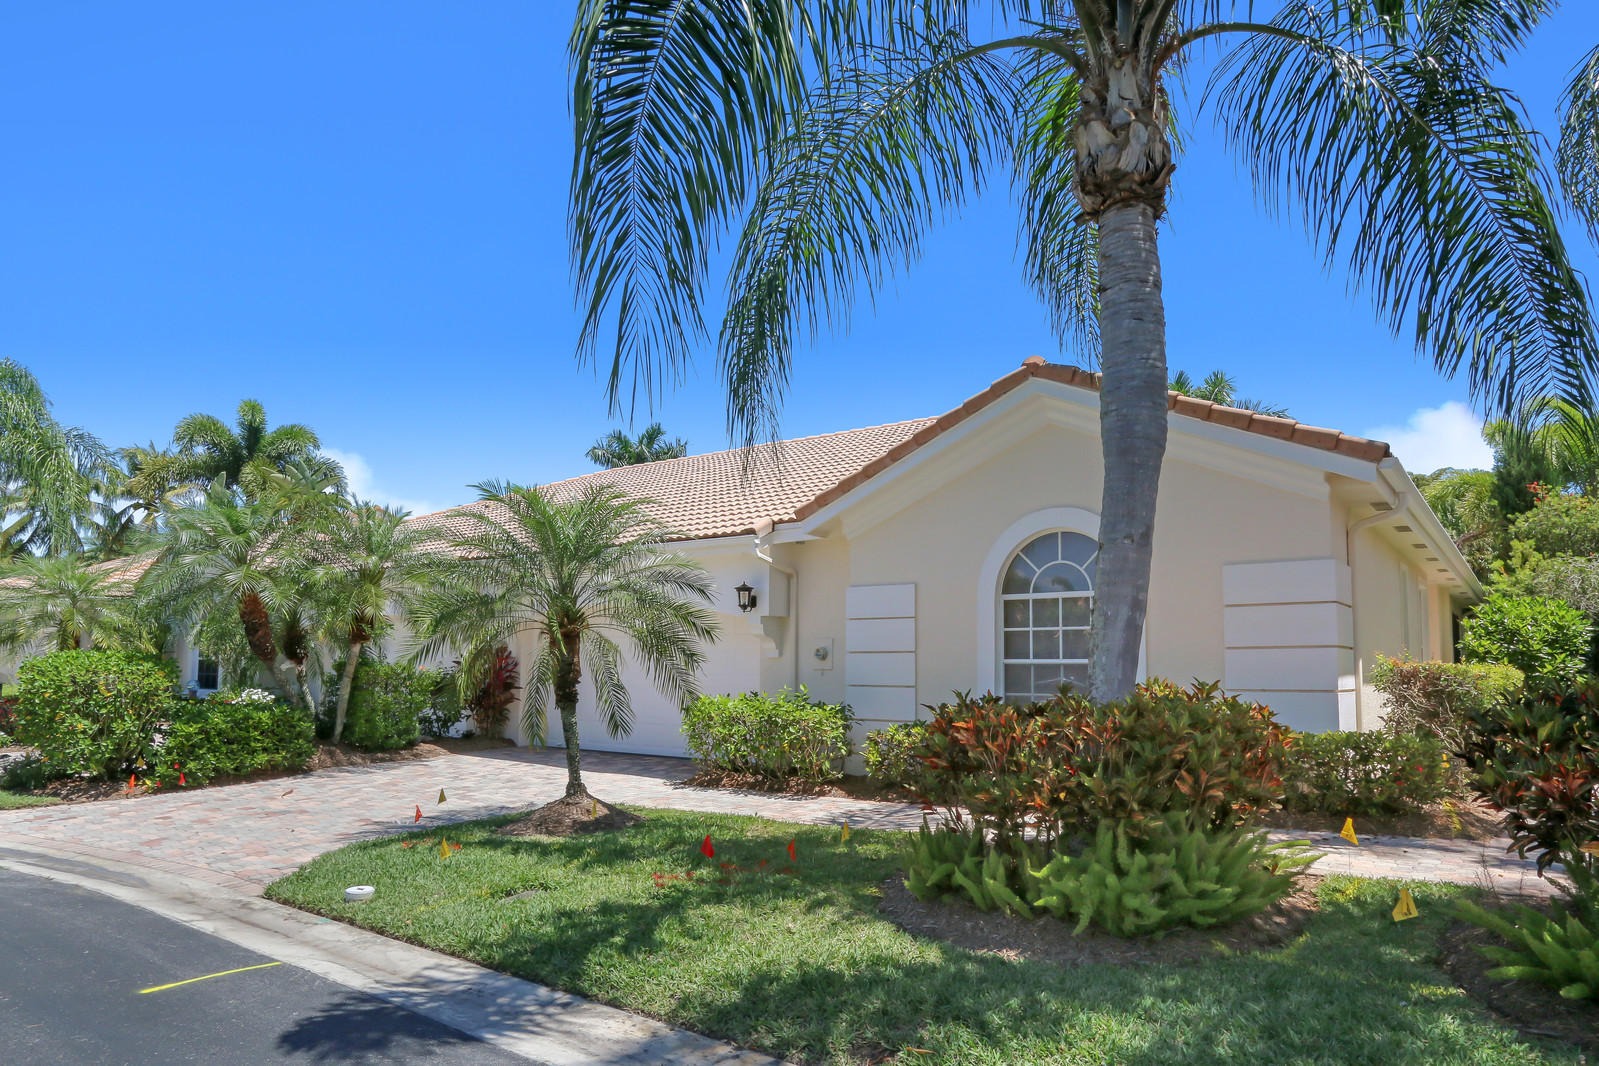 Details for 8172 Sandpiper Way, West Palm Beach, FL 33412